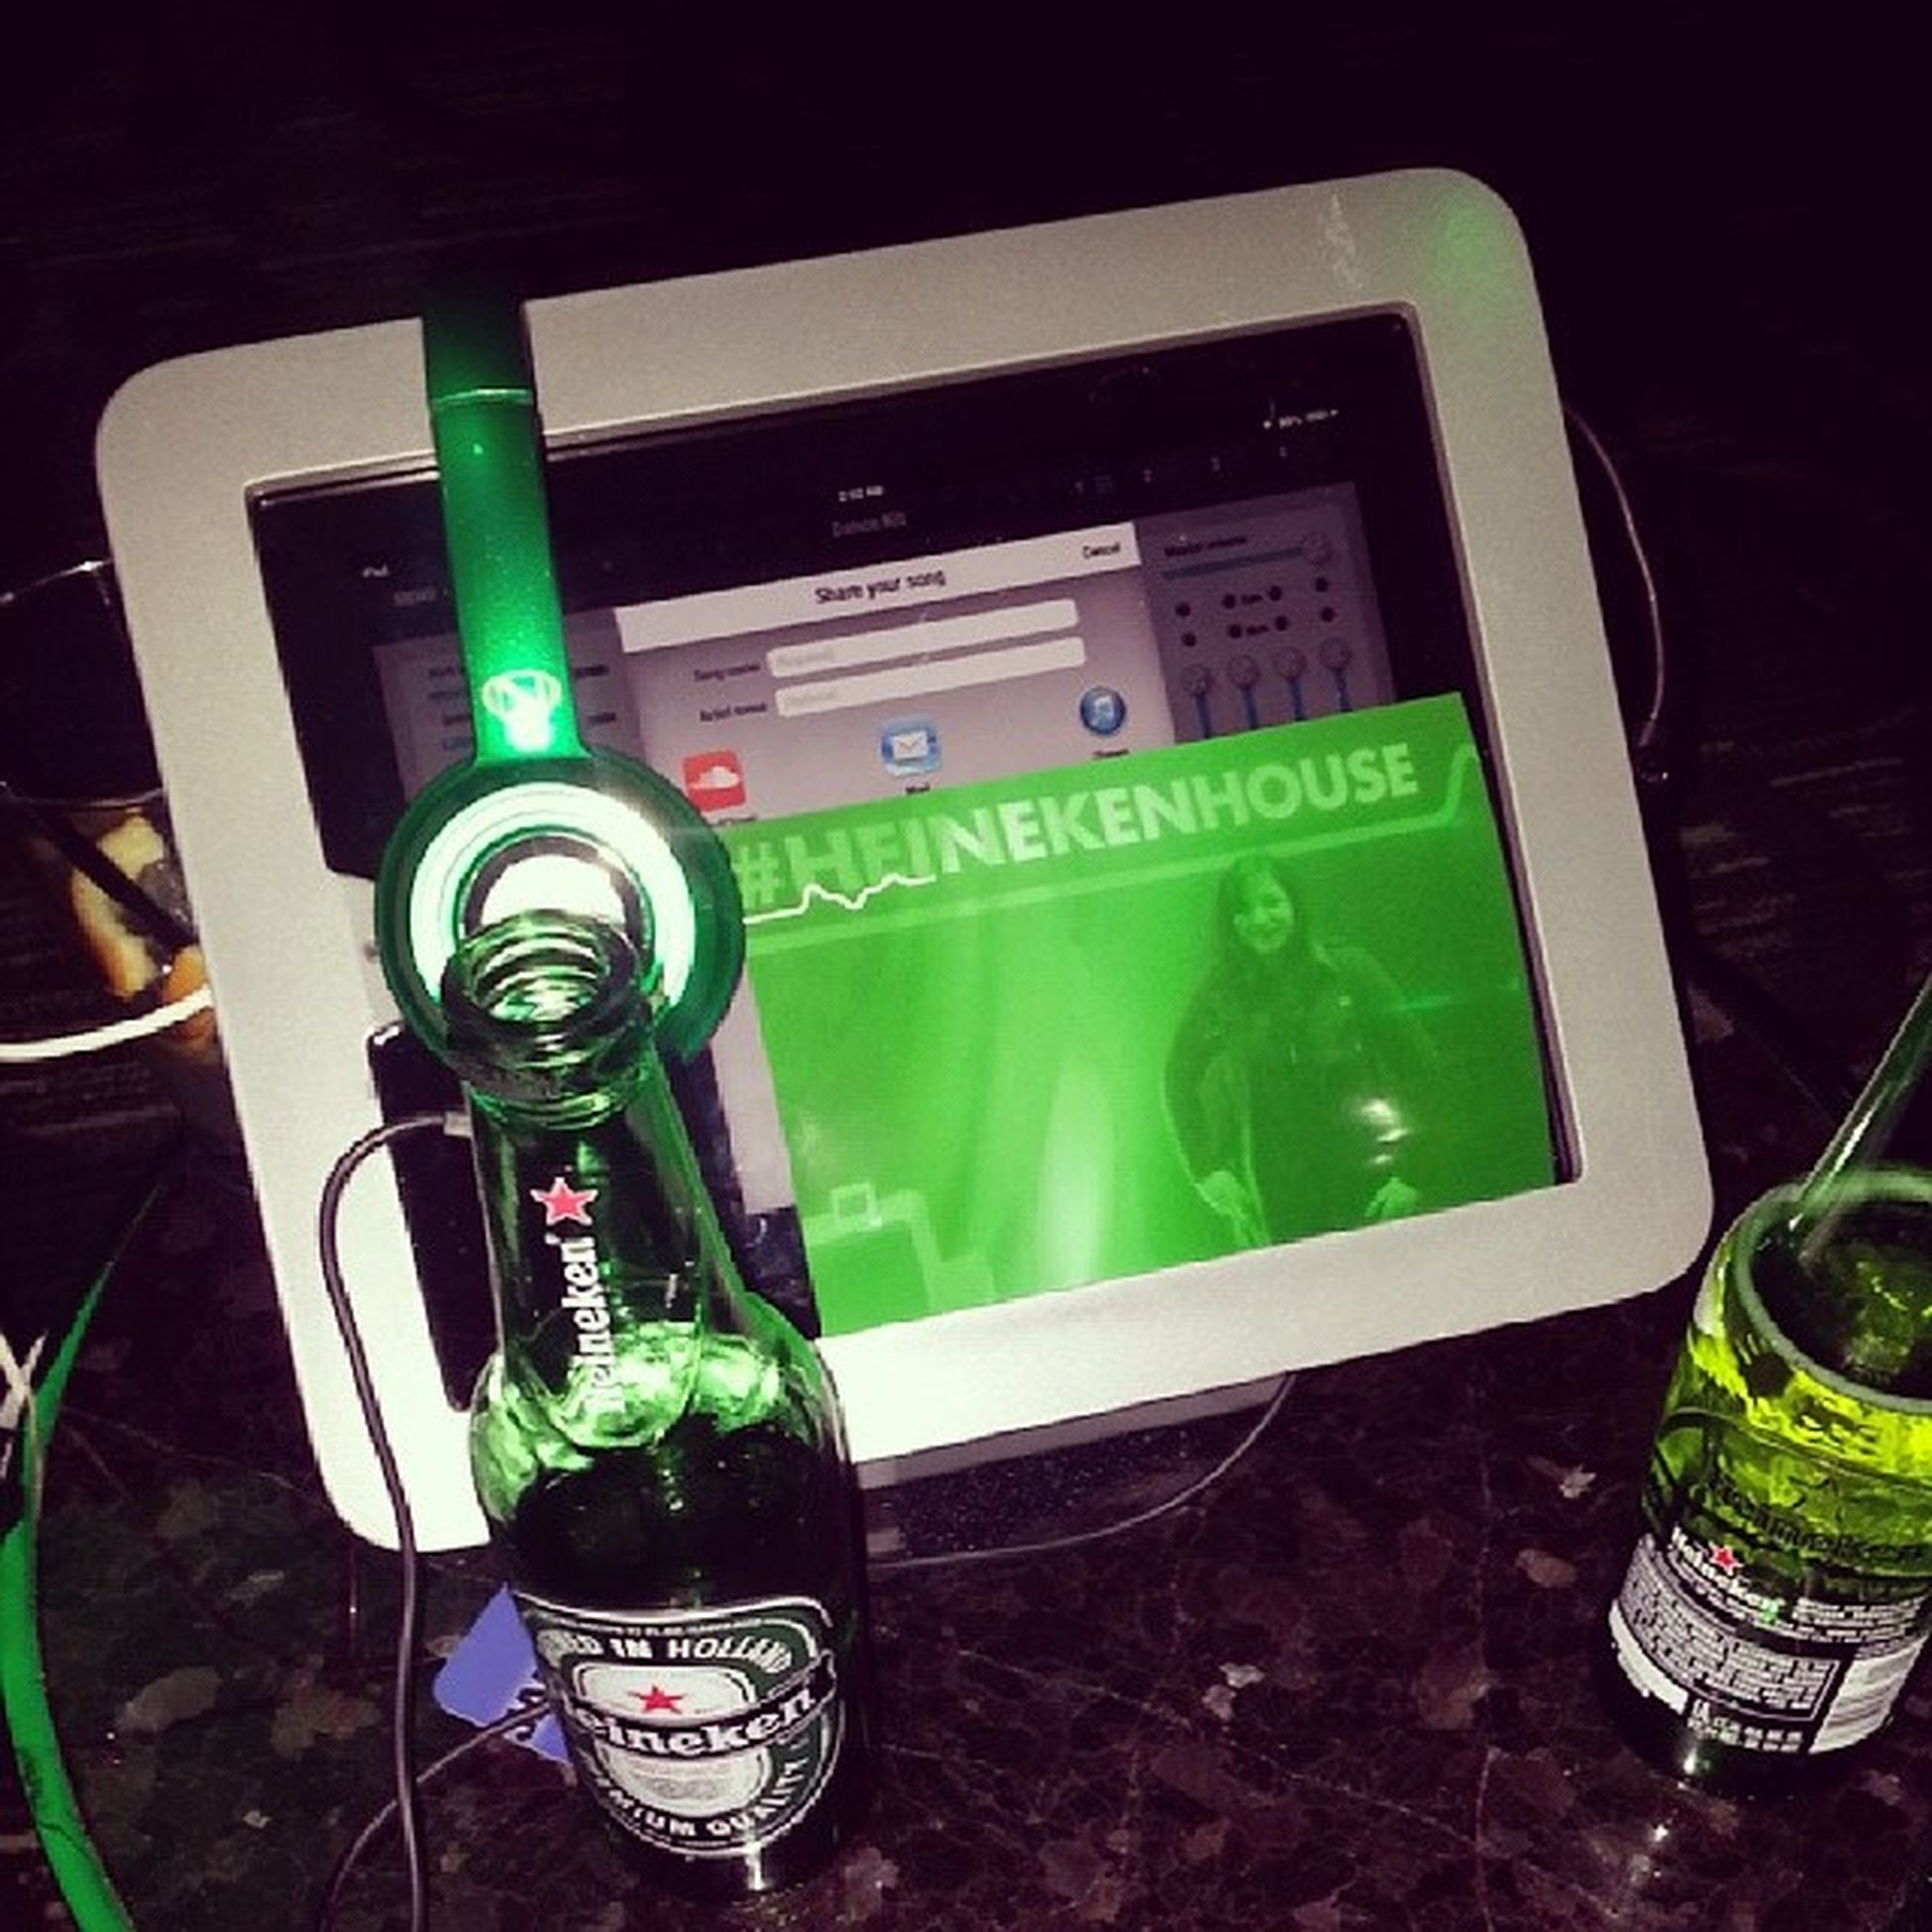 Heinekenhouse